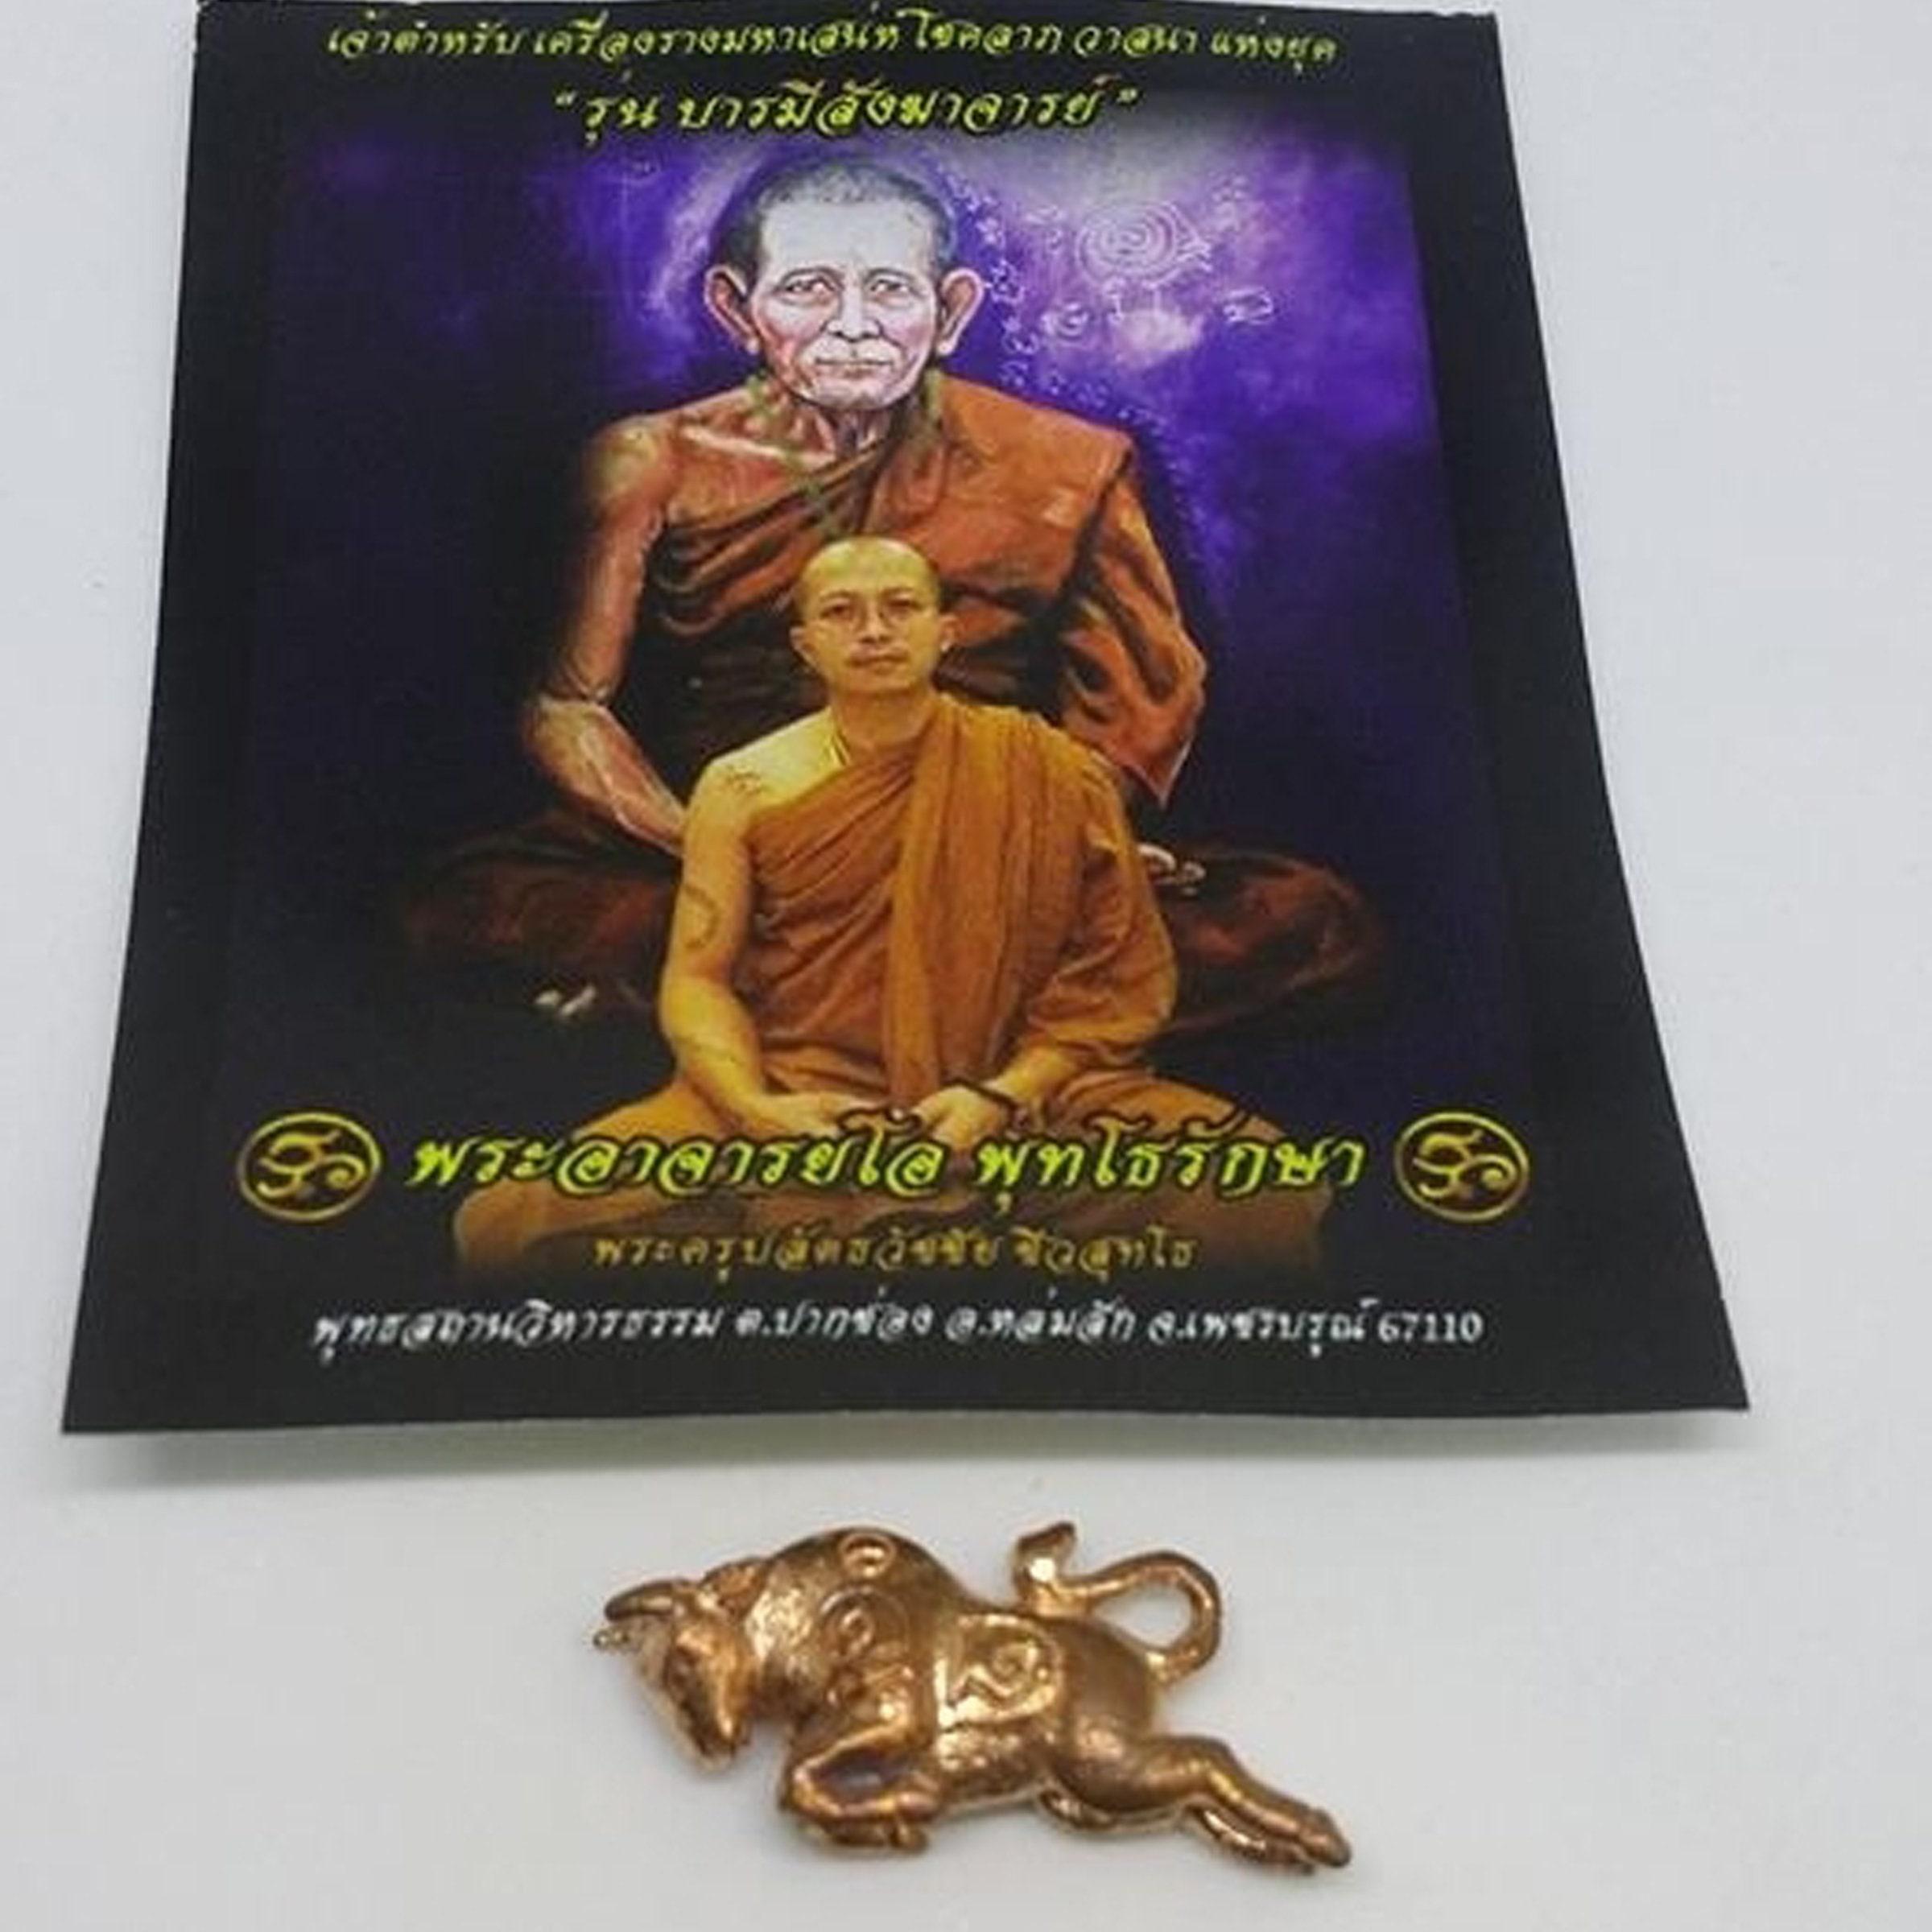 Lucky Buddha Jewelry PRA Pidta Closed Eye Thai Monk Amulet Lp Cron Bangsea Temple Thai Amulet